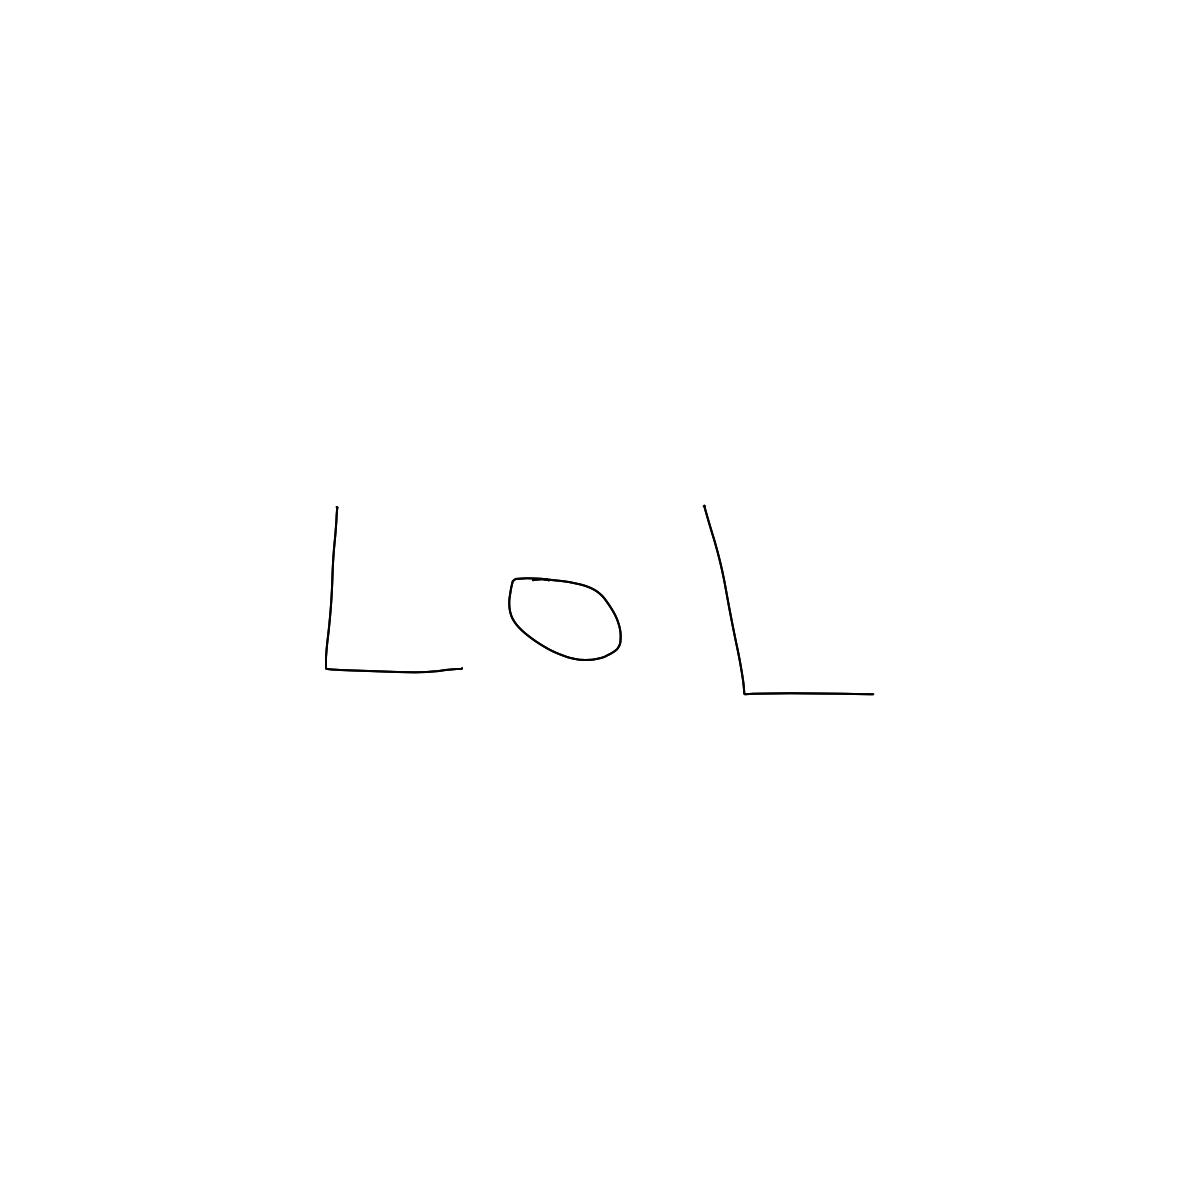 BAAAM drawing#6827 lat:-17.9566211700439450lng: 122.2165985107421900